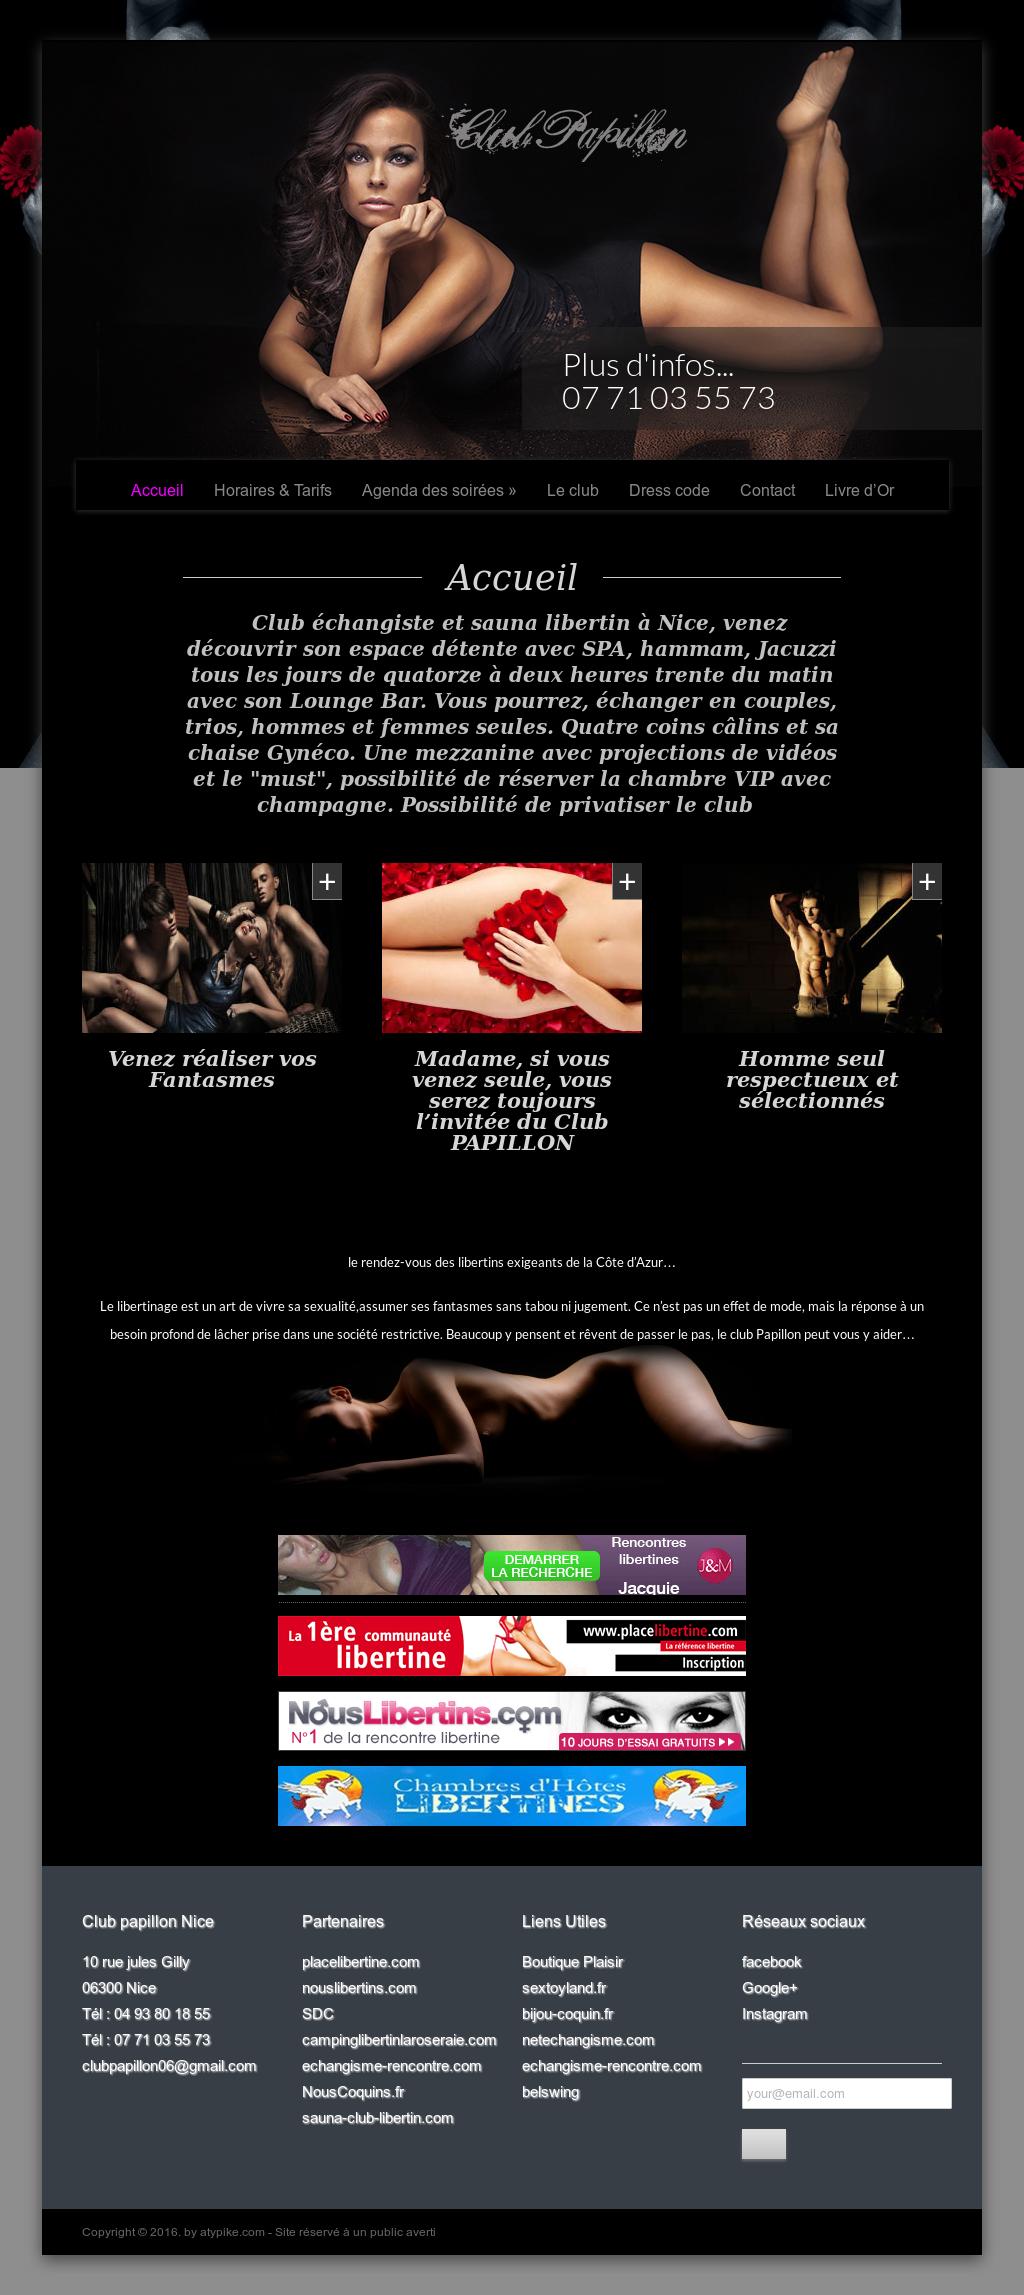 Espace abonne free mobile